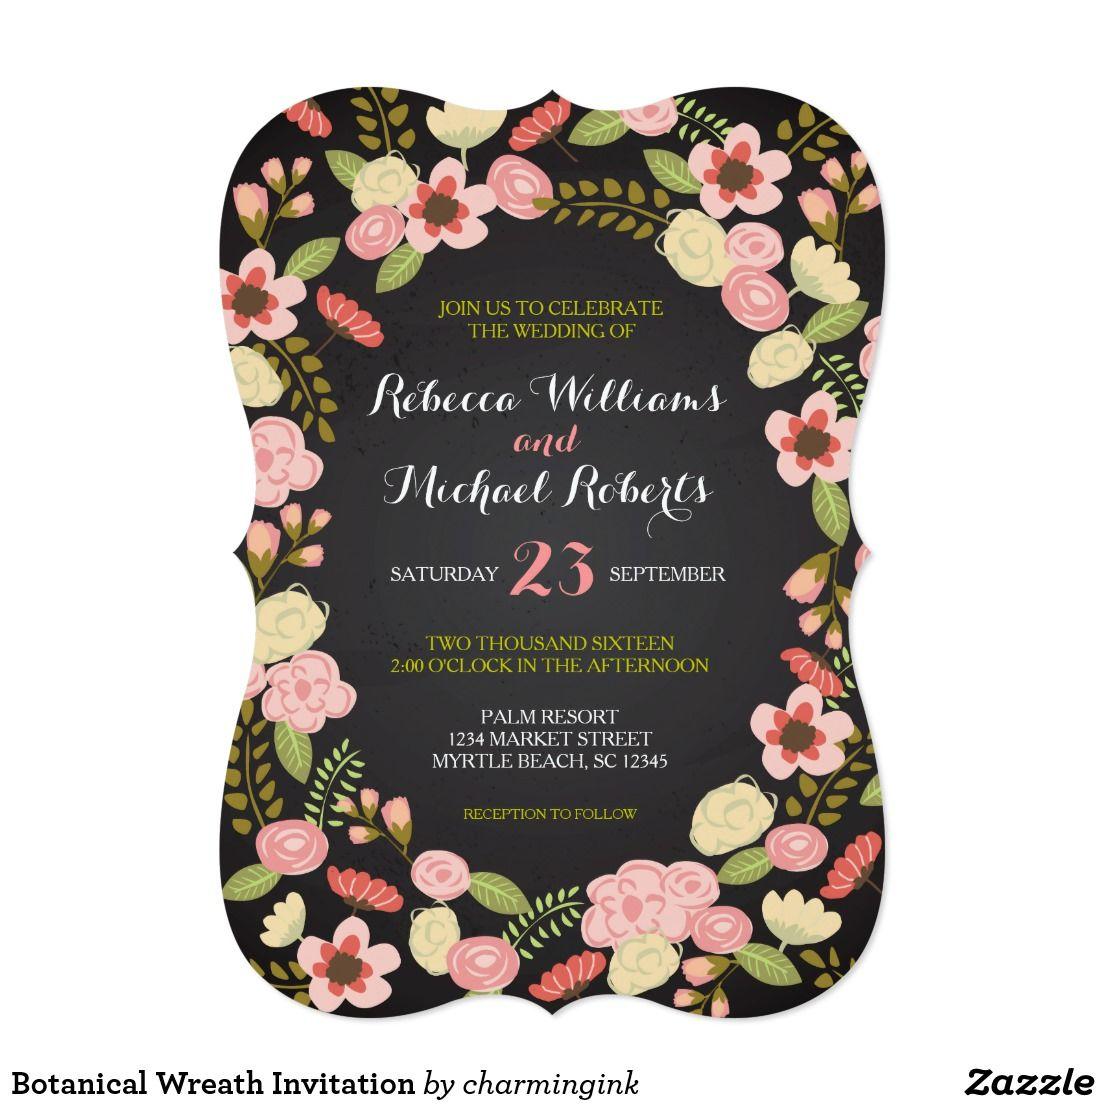 Botanical wreath invitation weddings